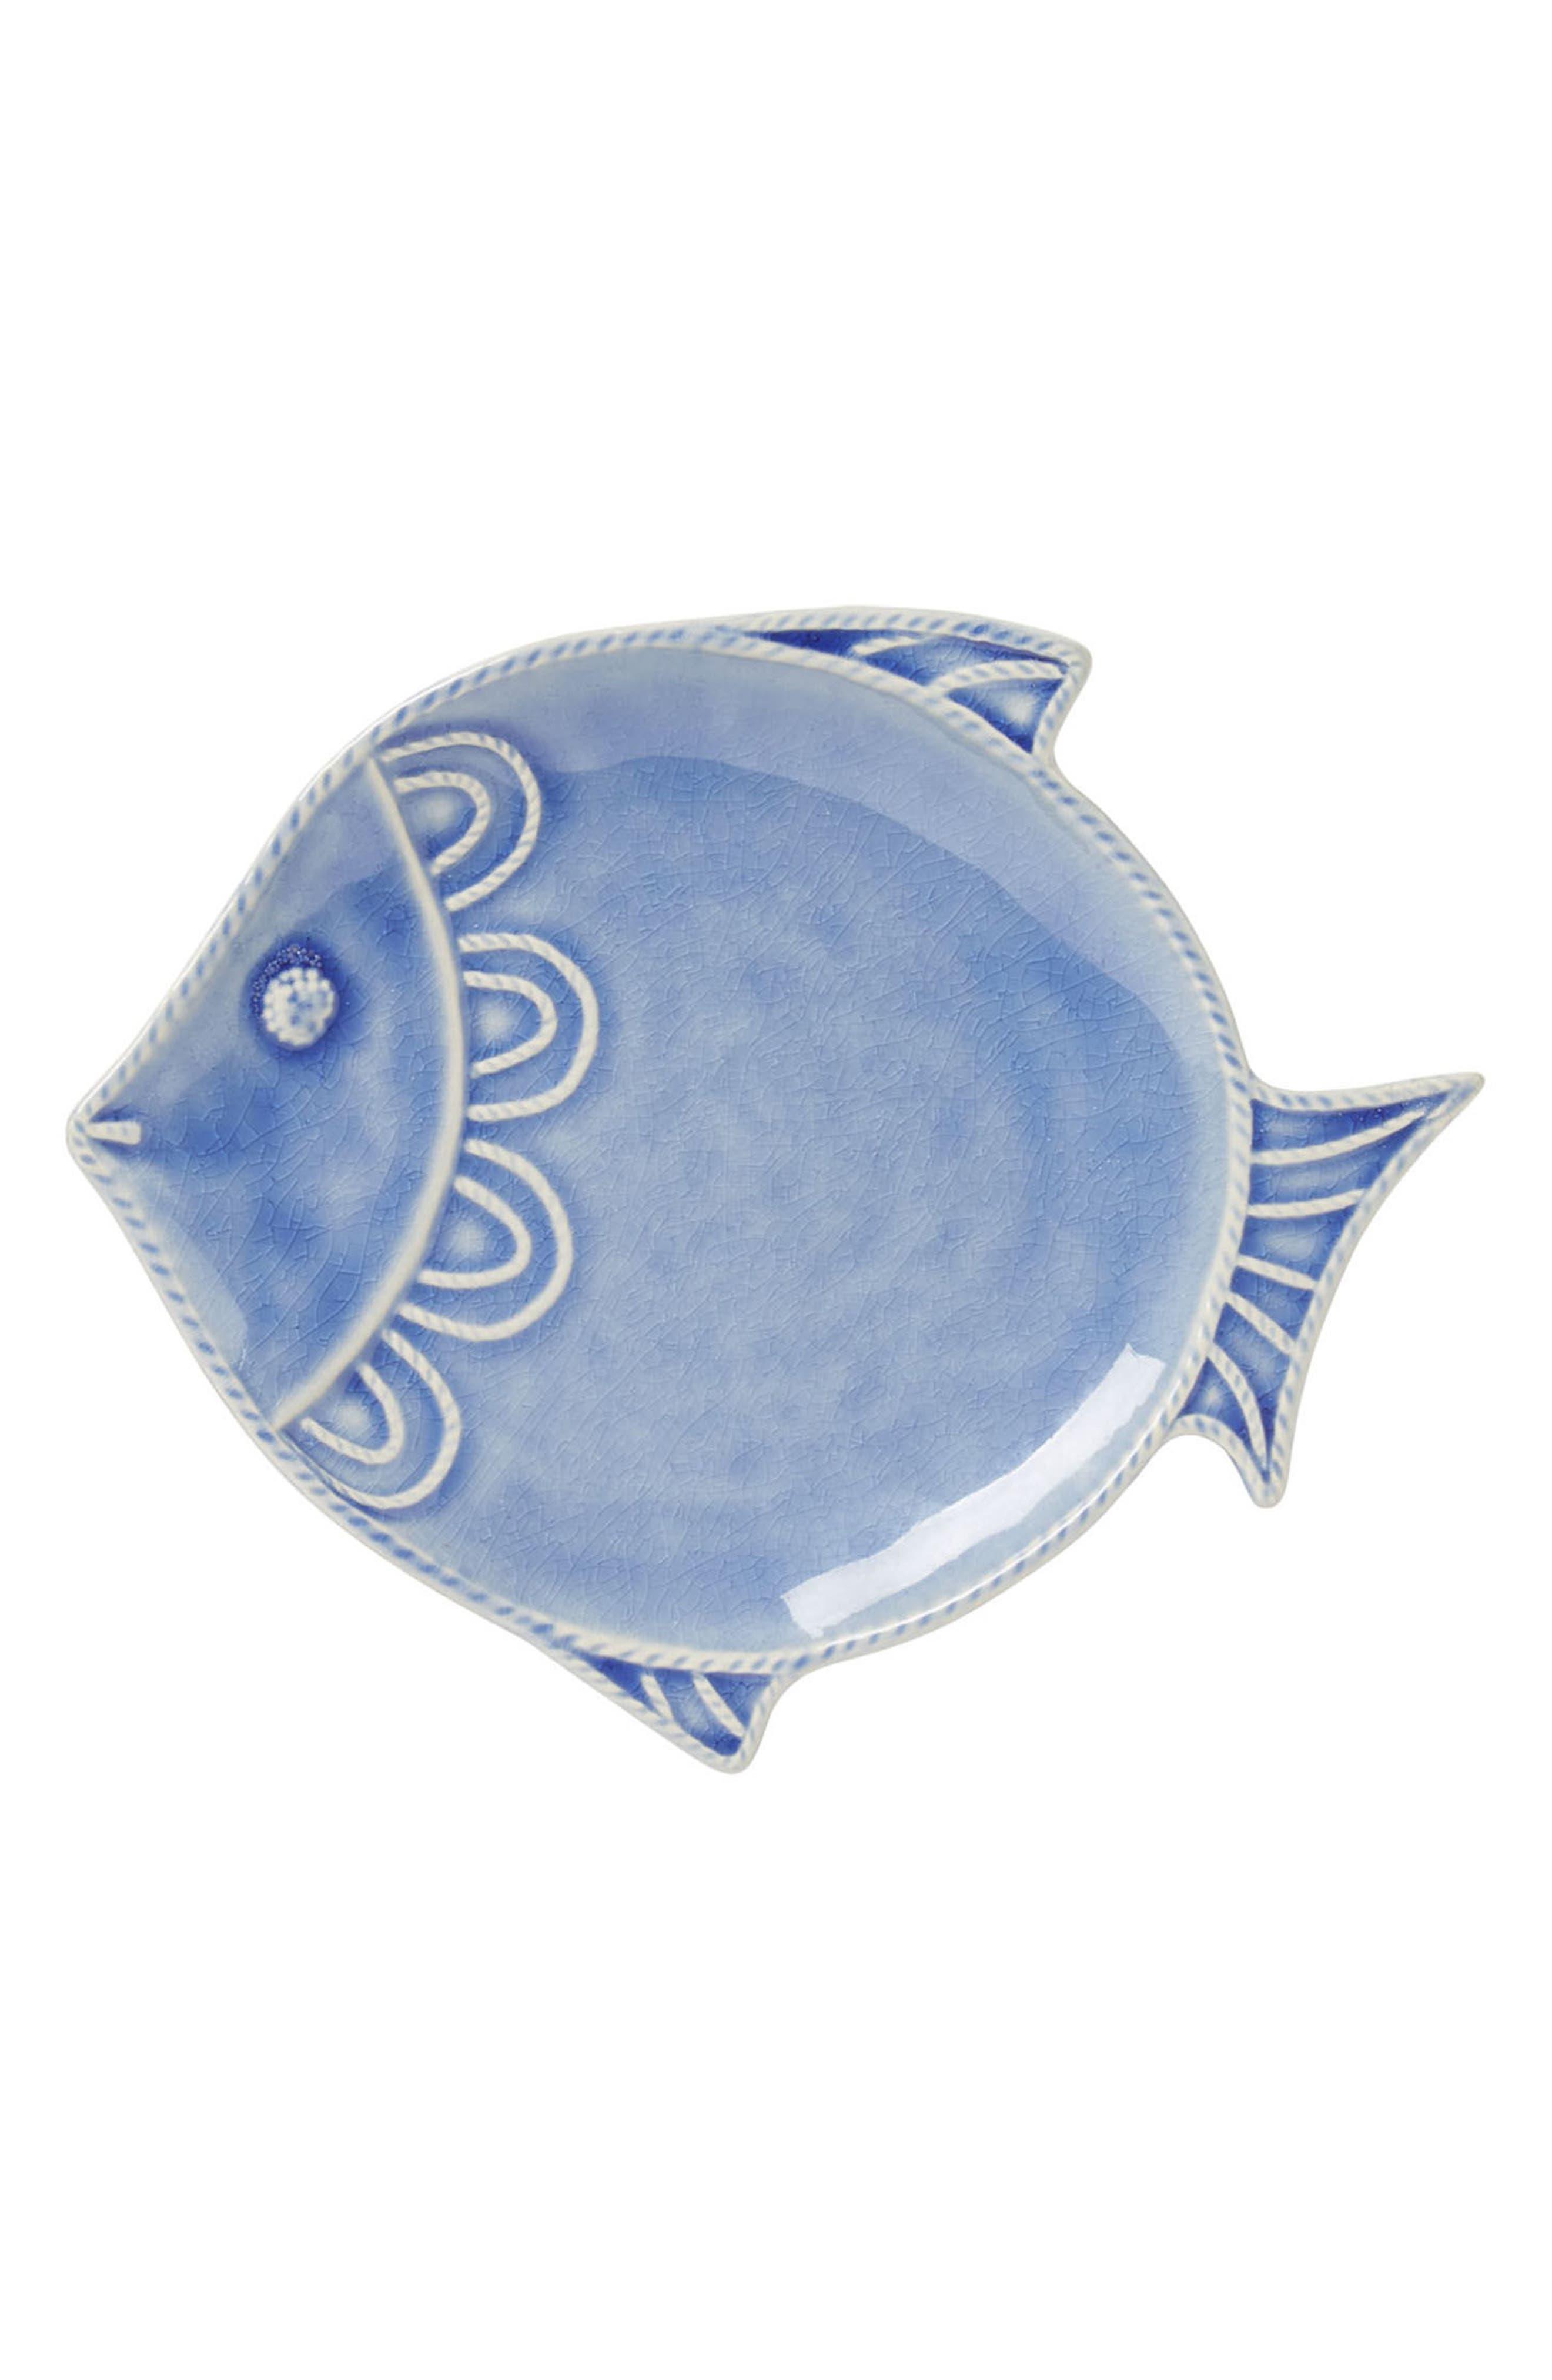 Berry & Thread Ceramic Fish Plate,                         Main,                         color, DELFT BLUE